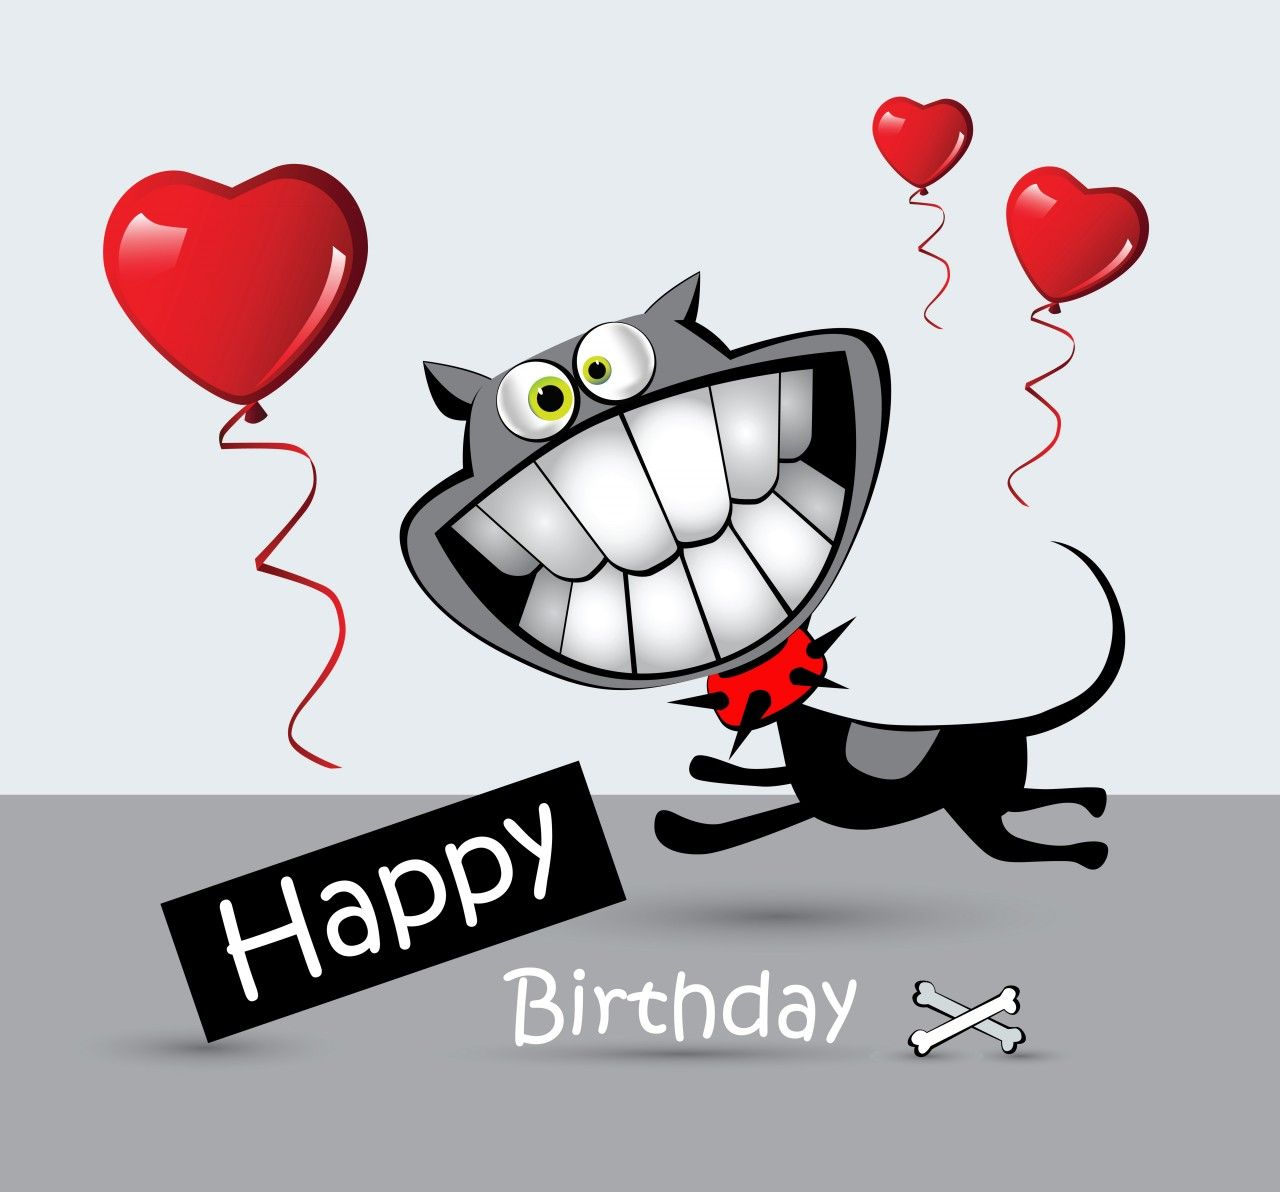 Happy Birthday Cards Funny - Google Posts Cartoon